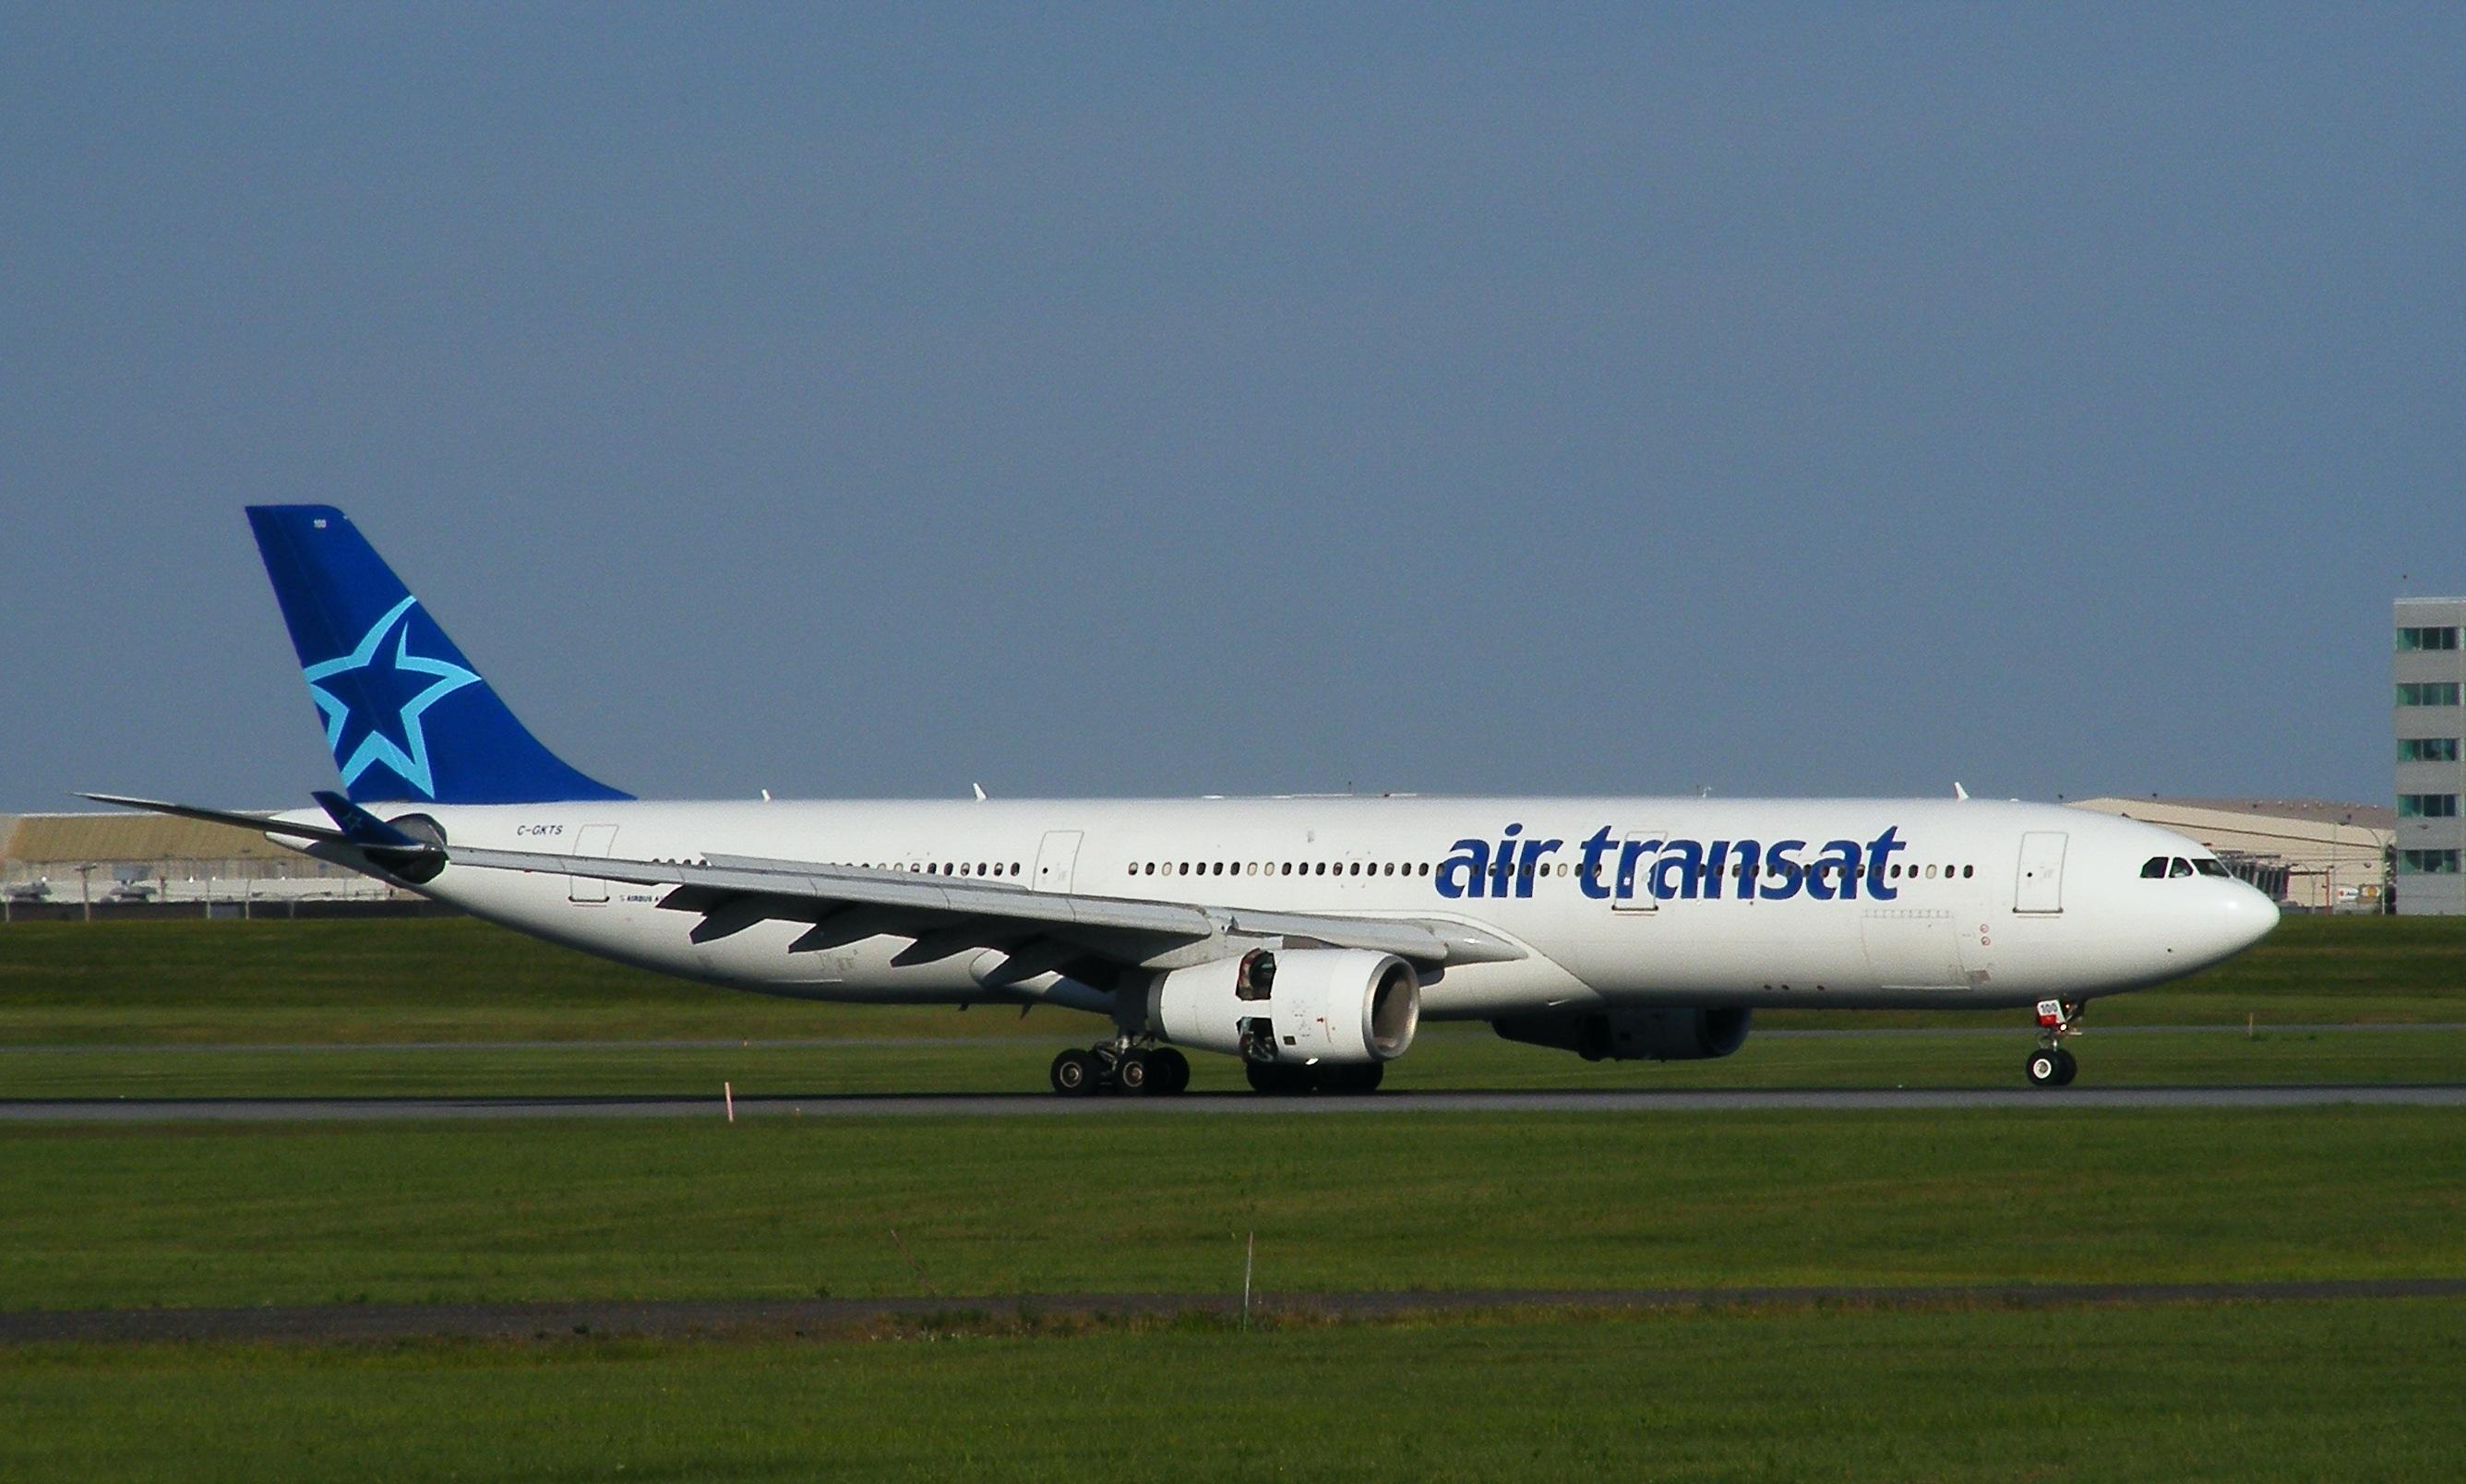 Air Transat #